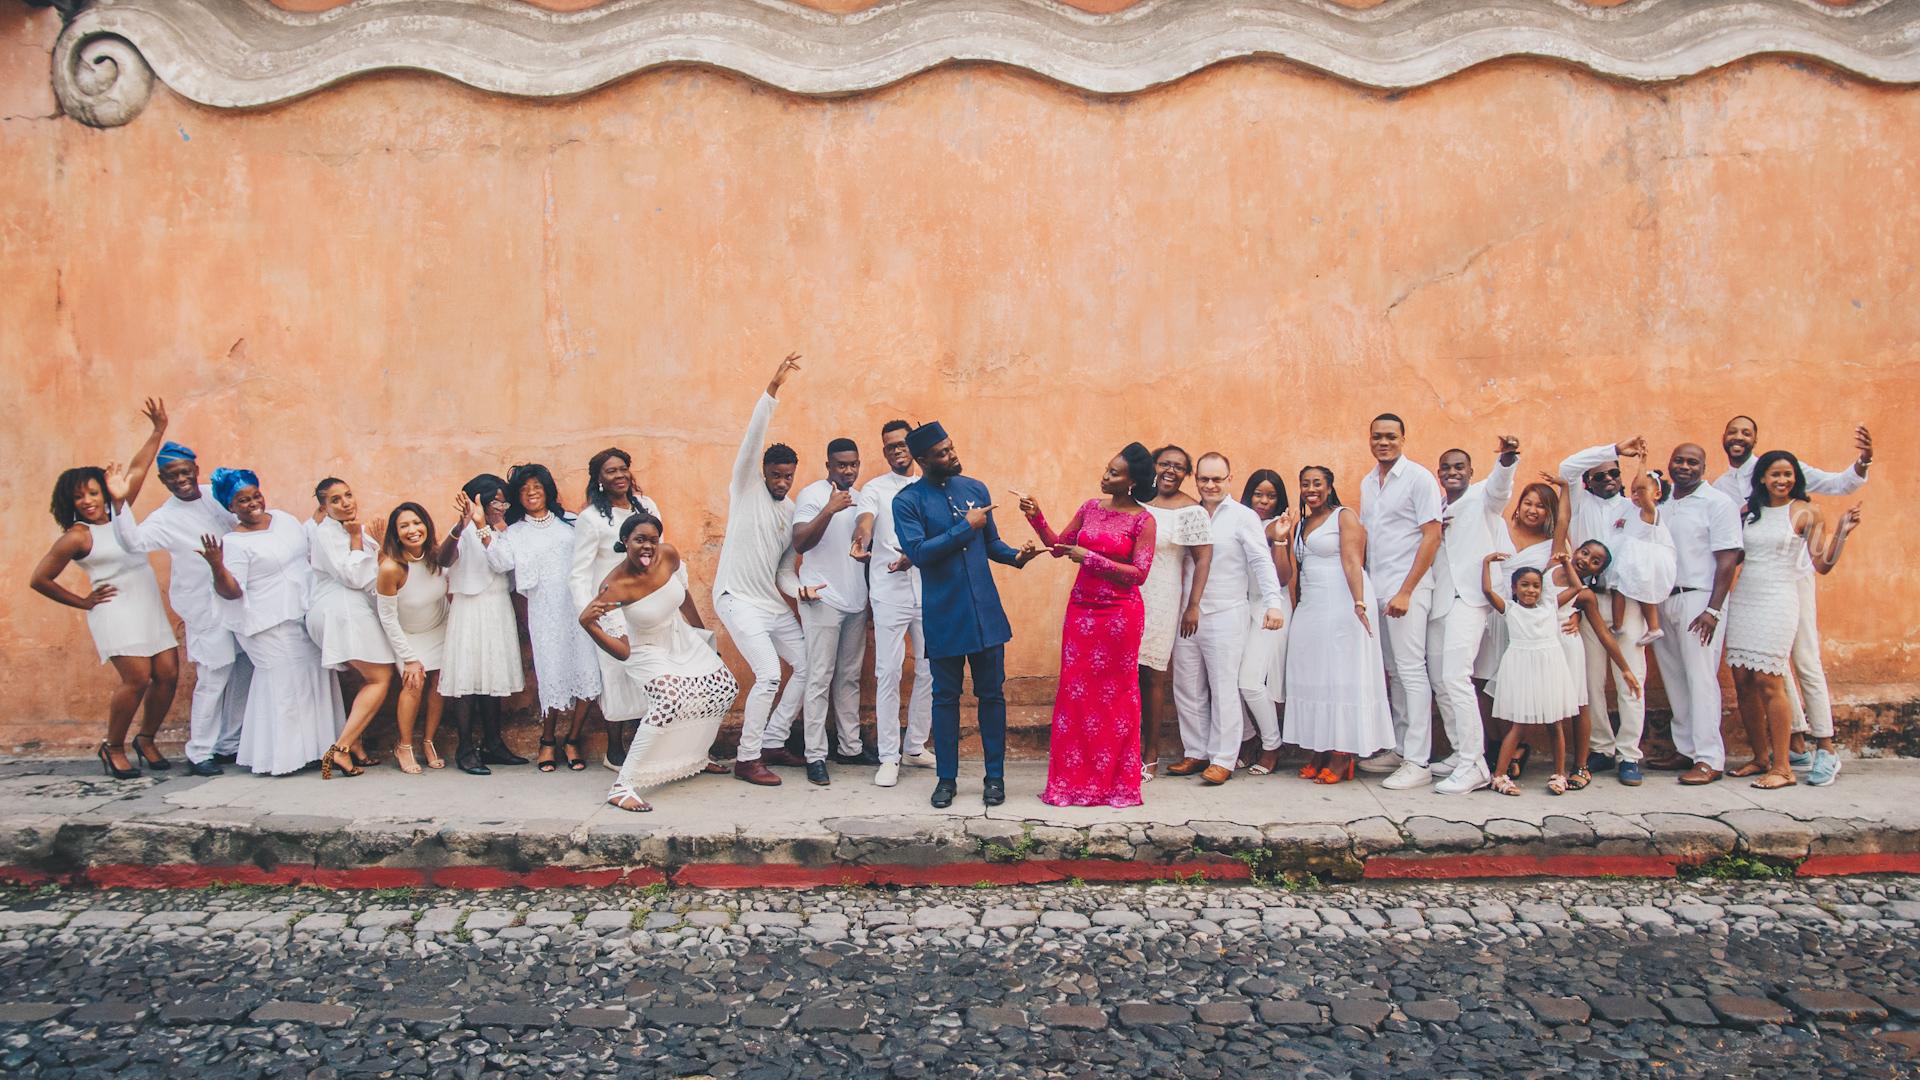 Marie + Seun | Antigua Guatemala, Guatemala | Iglesia y Convento de las Capuchinas